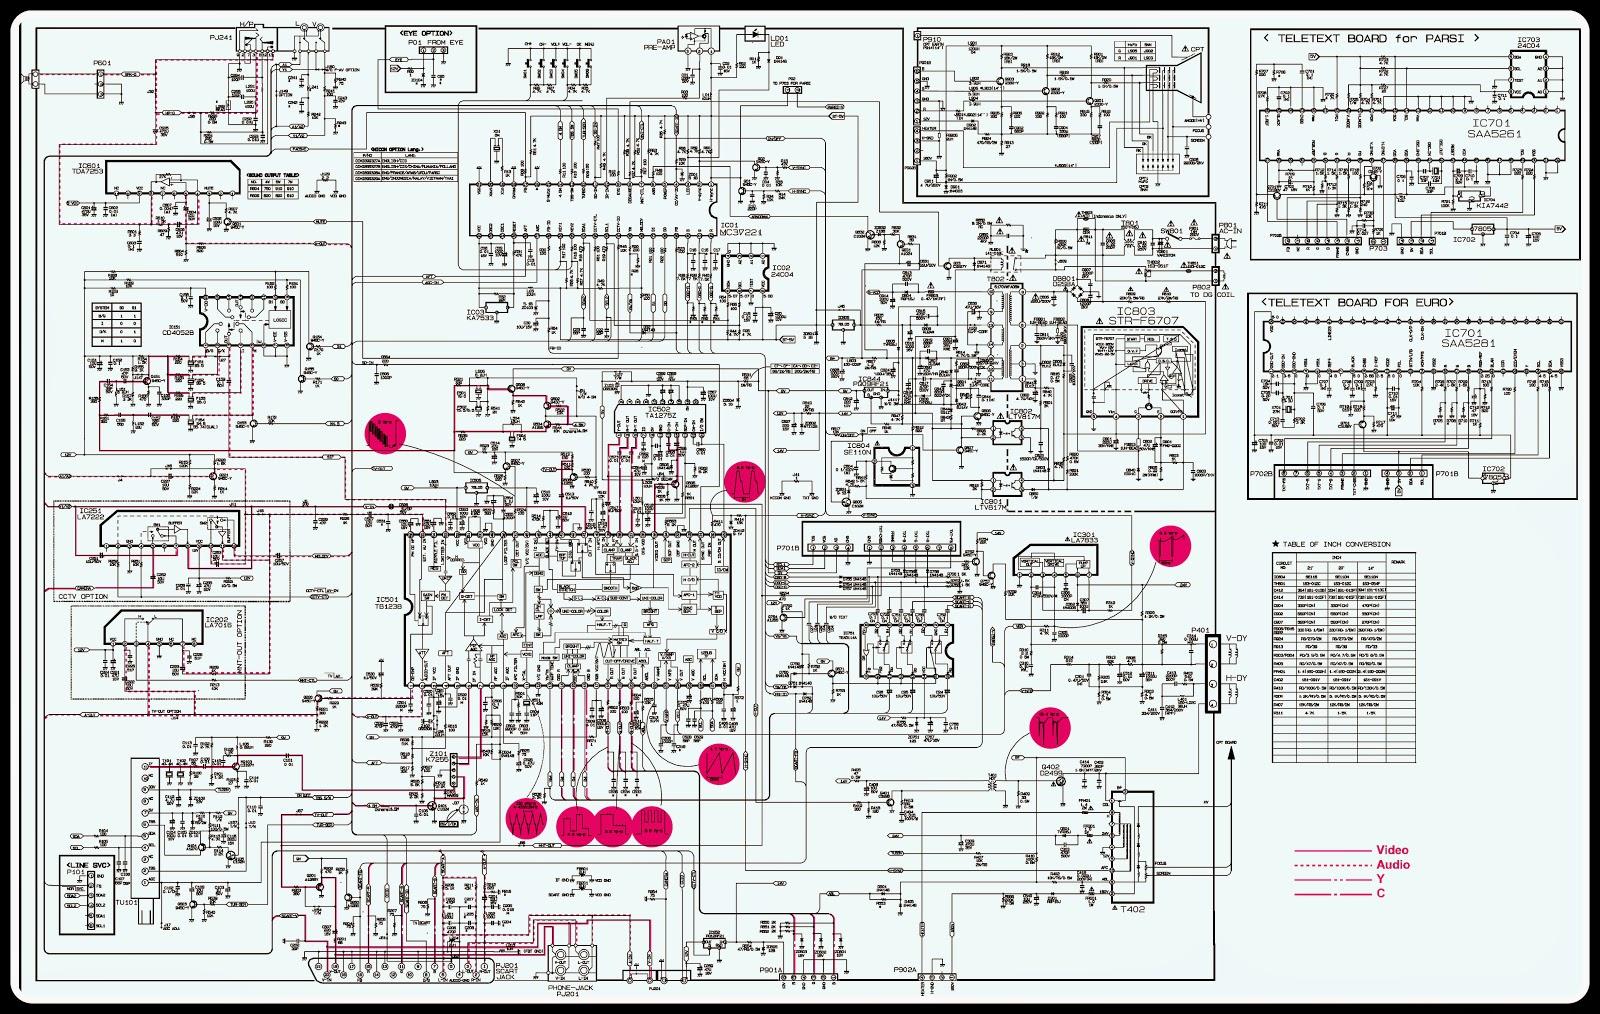 ge nautilus dishwasher wiring diagram images x jpeg kb ge microwave oven wiring diagram a guide [ 1600 x 1014 Pixel ]